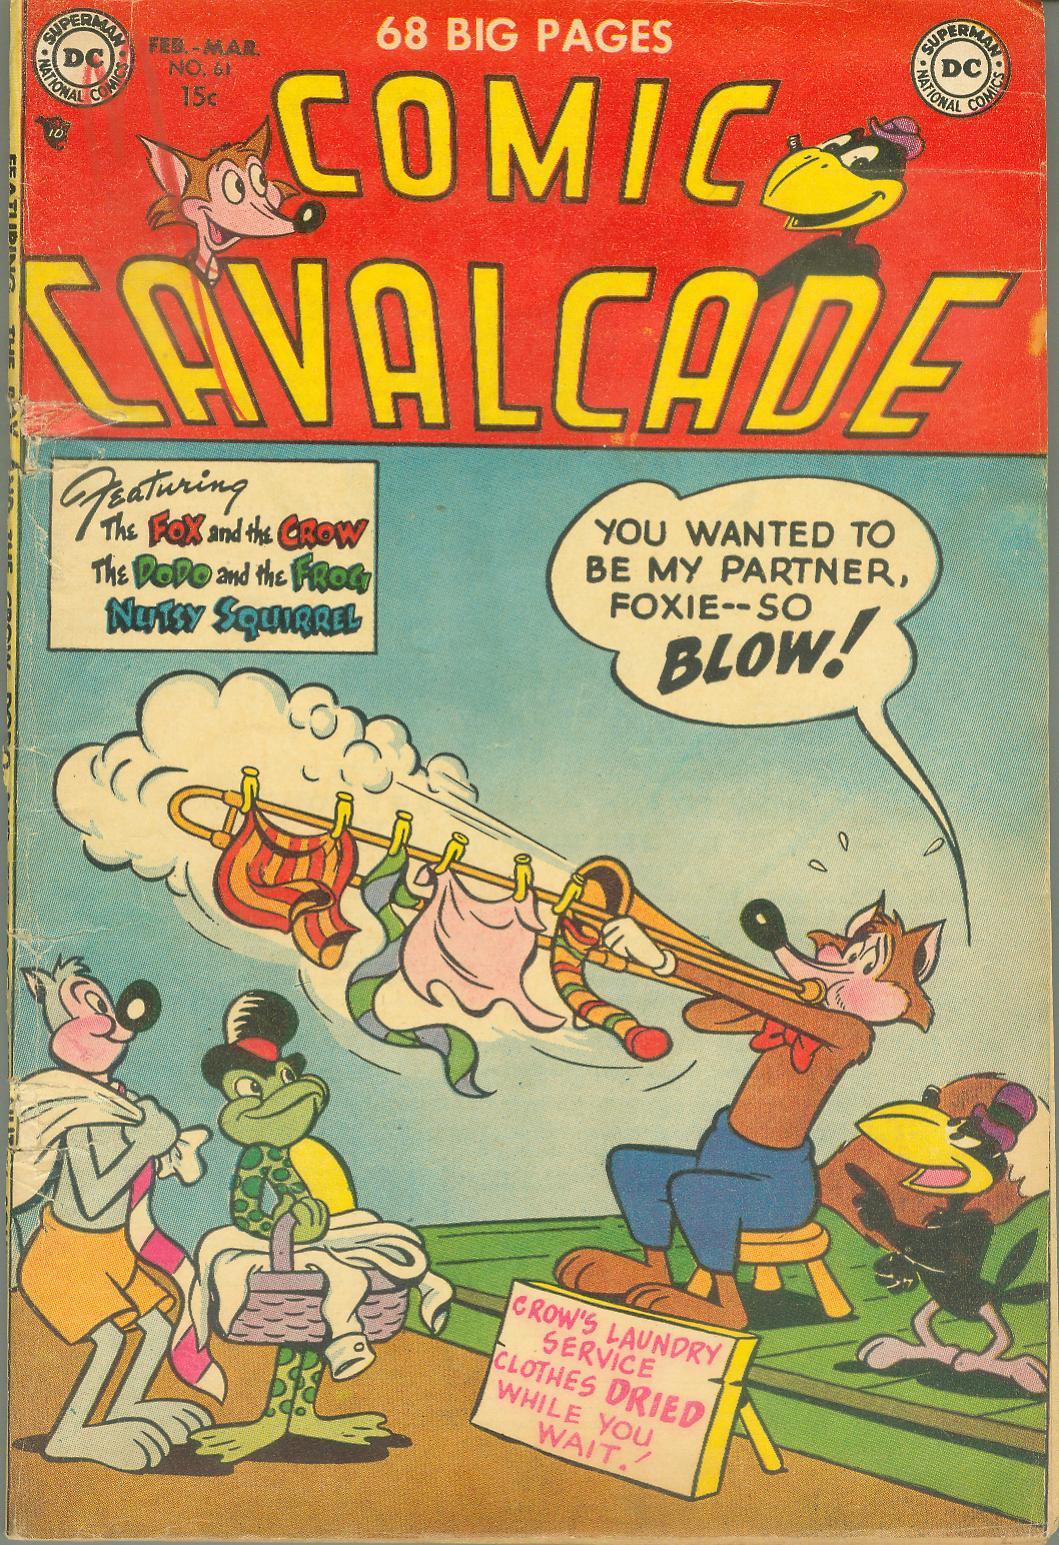 Comic Cavalcade issue 61 - Page 1